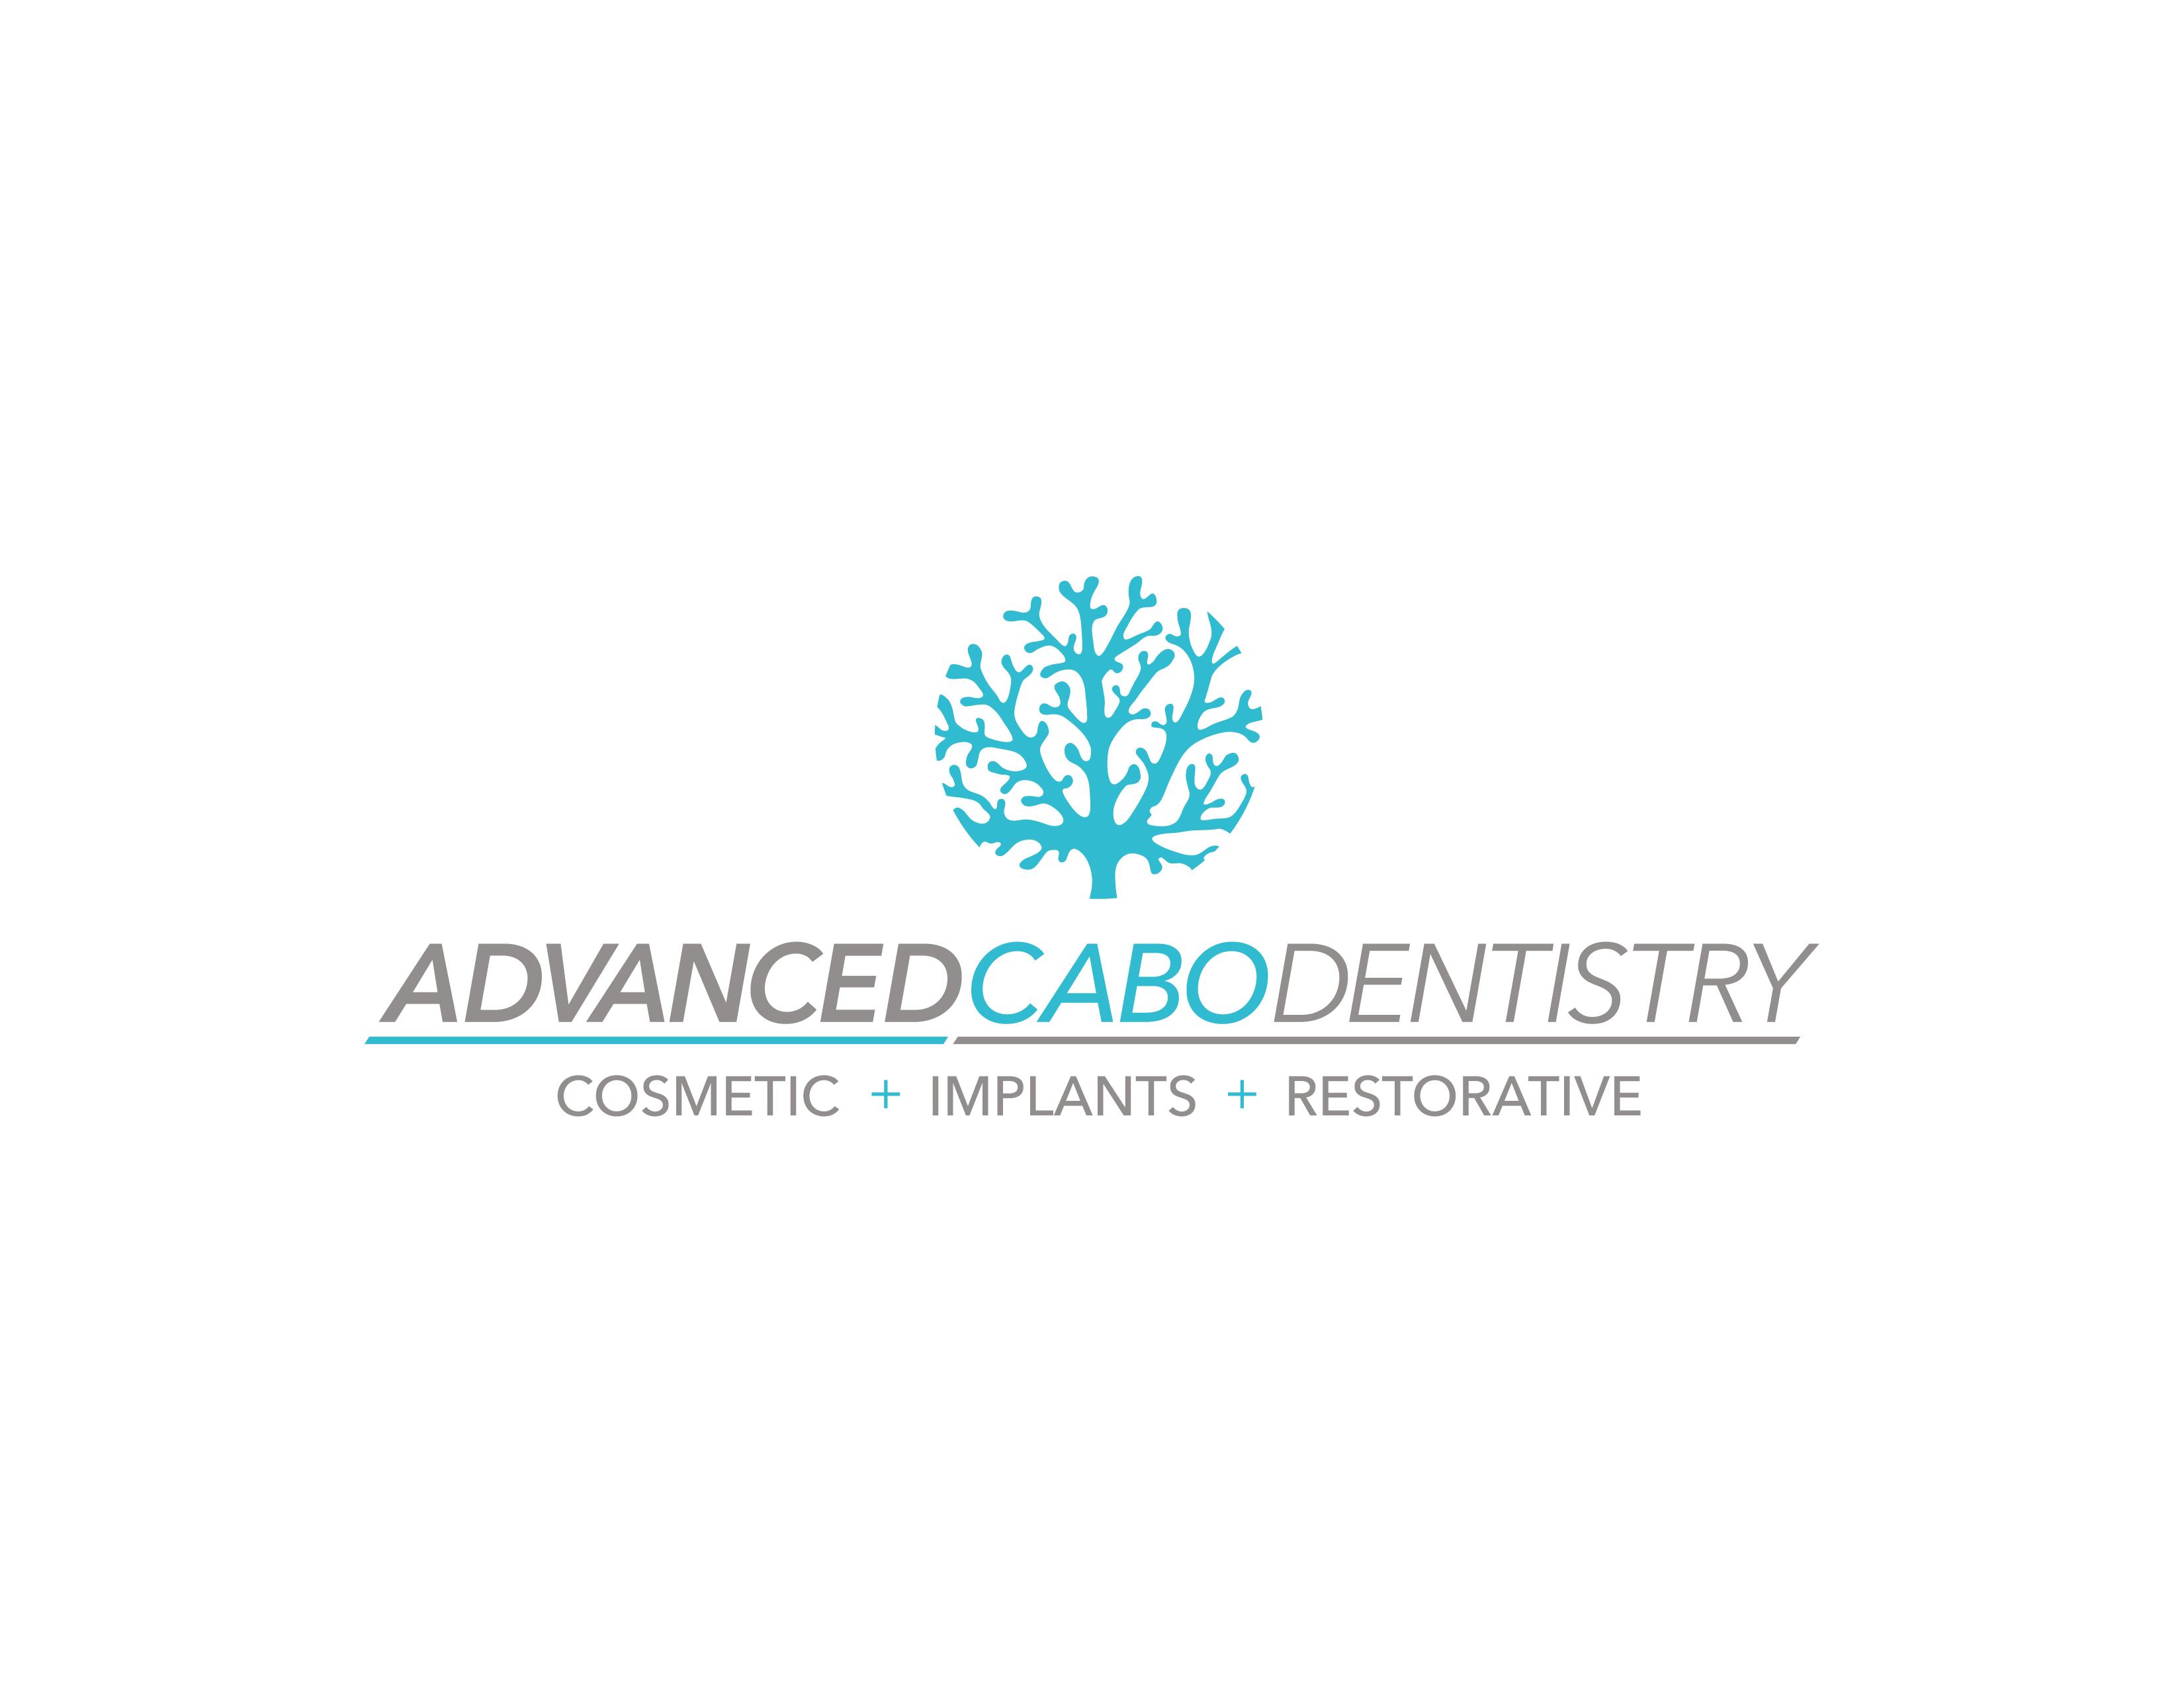 advanced cabo dentistry